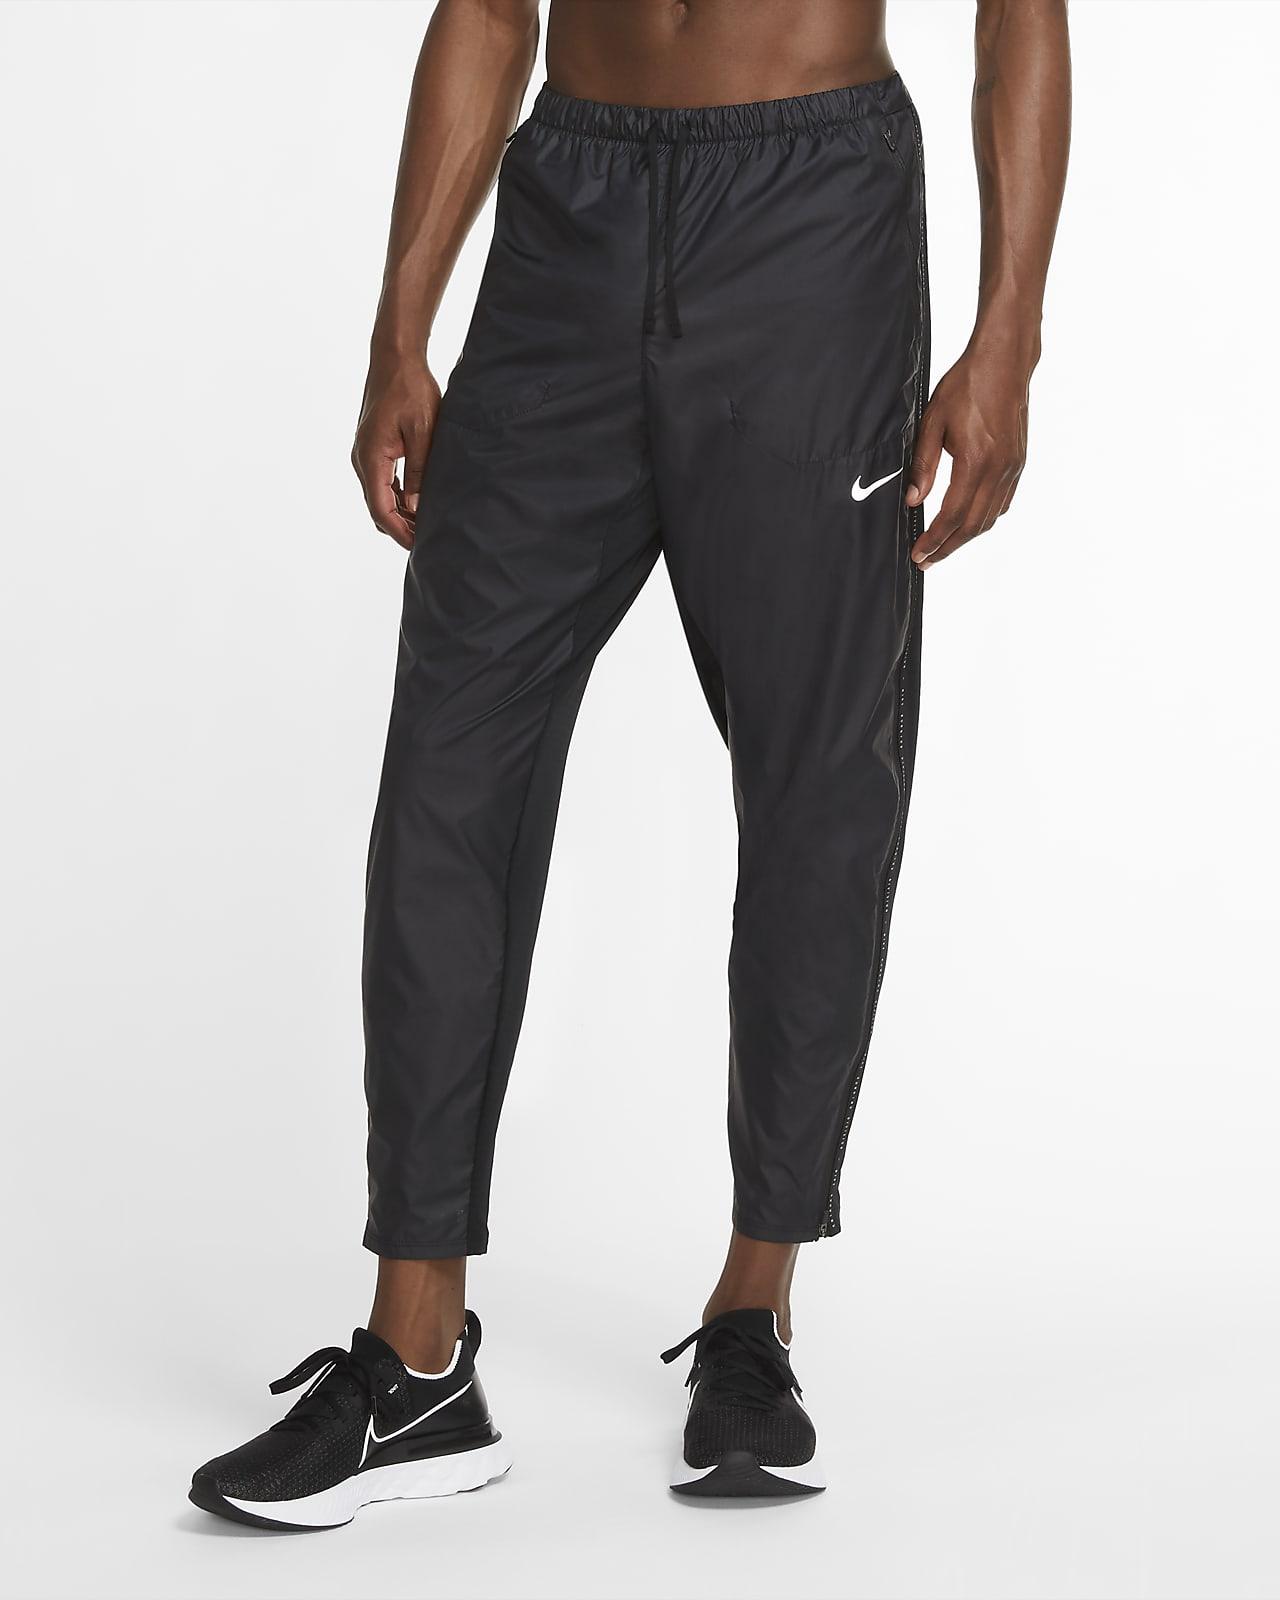 Pantalon de running Nike Phenom Elite Shield Run Division pour Homme